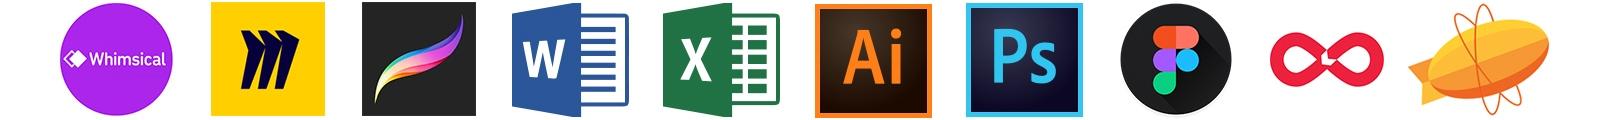 Tools: Whimsical, Miro, Procreate, Microsoft Word, Microsoft Excel, Adobe Illustrator, Adobe Photoshop, Figma, Lookback, Zeplin